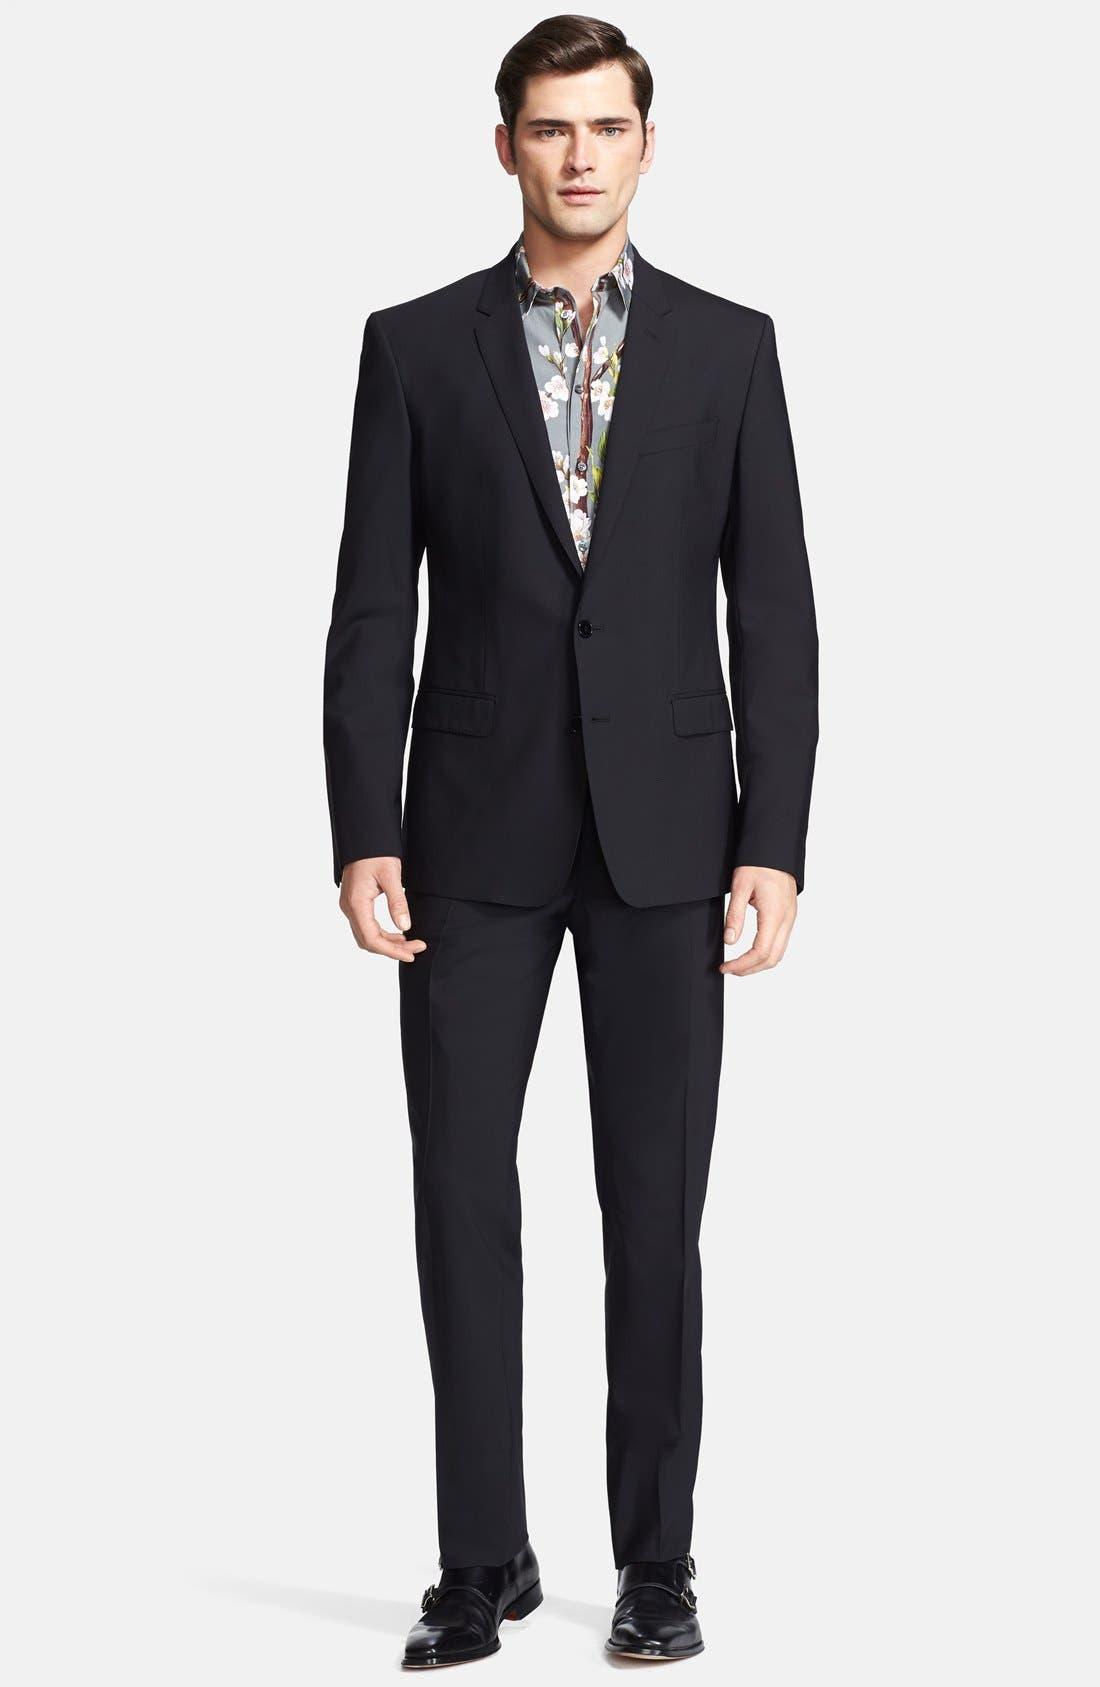 Main Image - Dolce&Gabbana 'Martini' Stretch Wool Suit